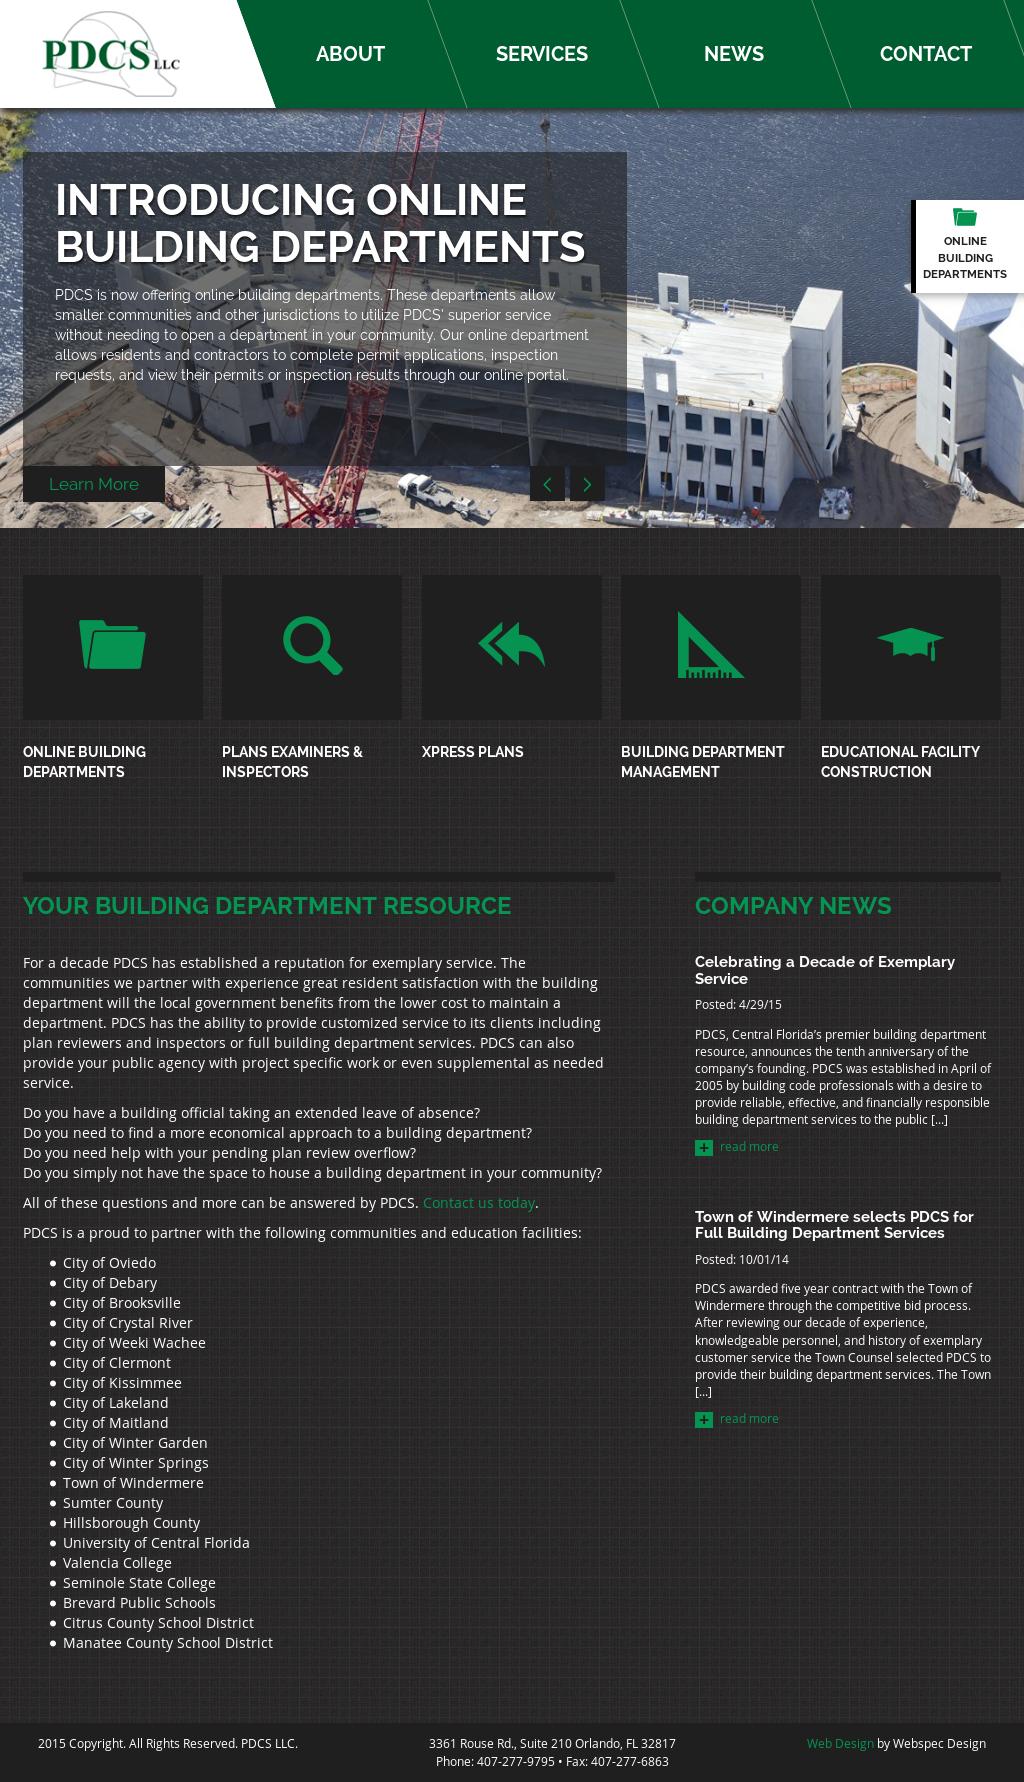 Pdcs Competitors, Revenue and Employees - Owler Company Profile